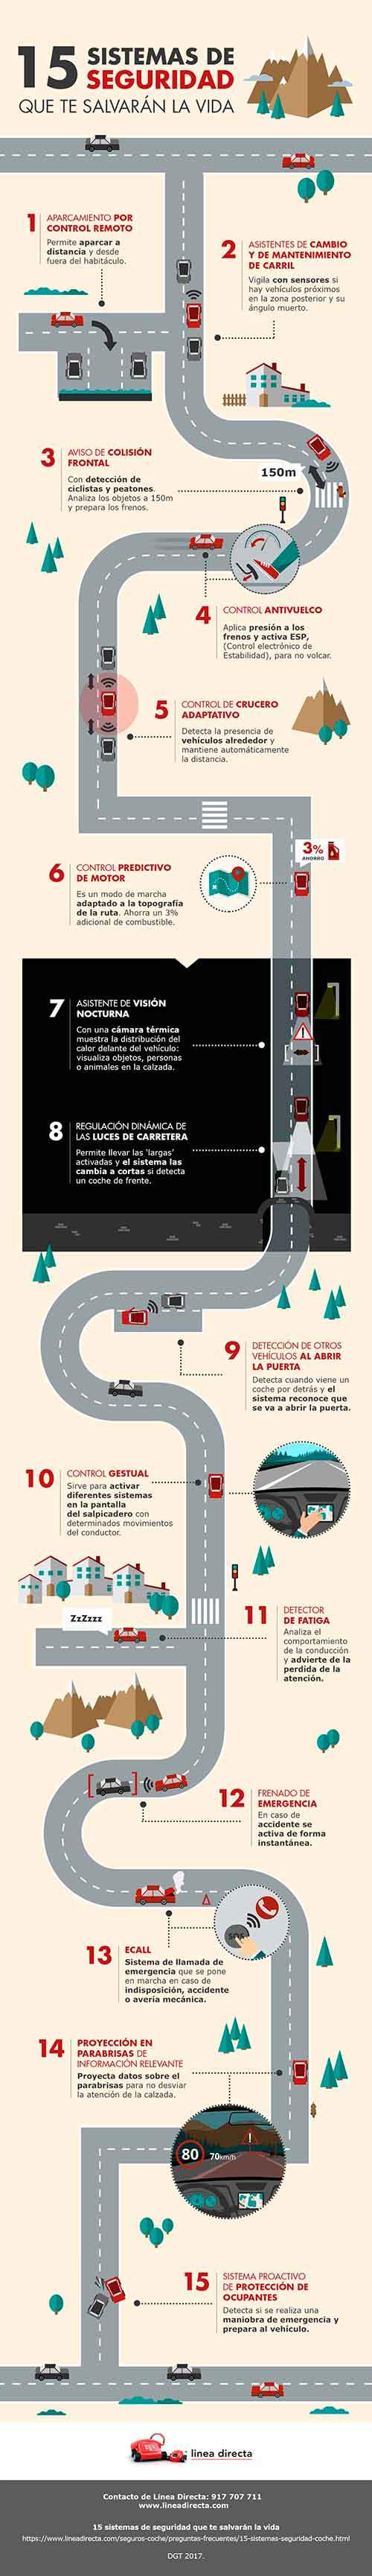 Infografia 15 sistemas de seguridad que te salvarán la vida